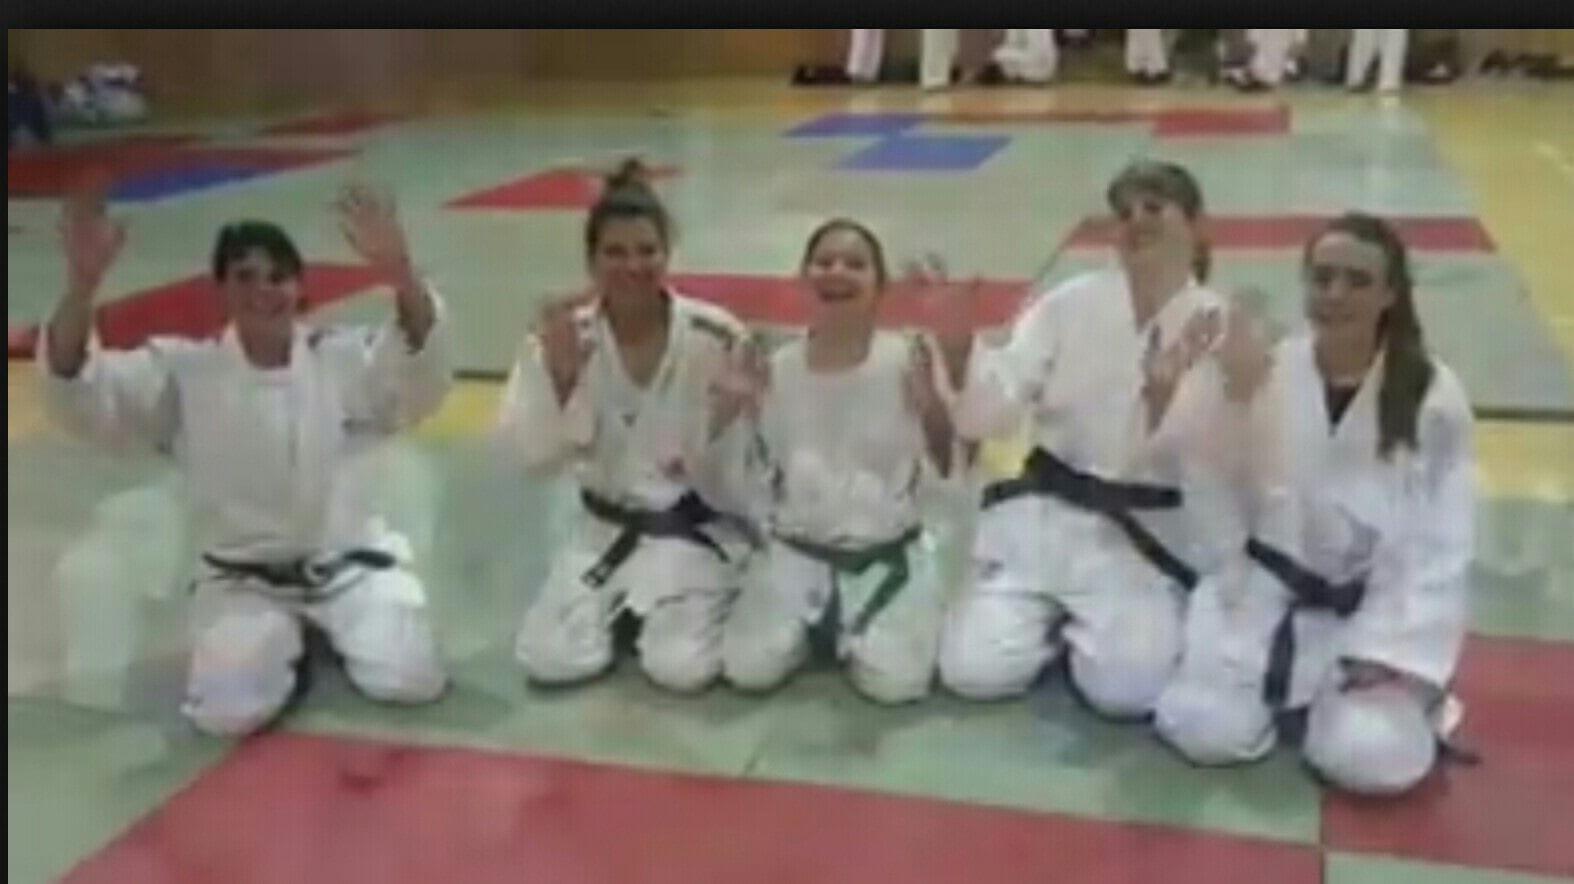 KOBE judo femenino Carabanchel nos necesita